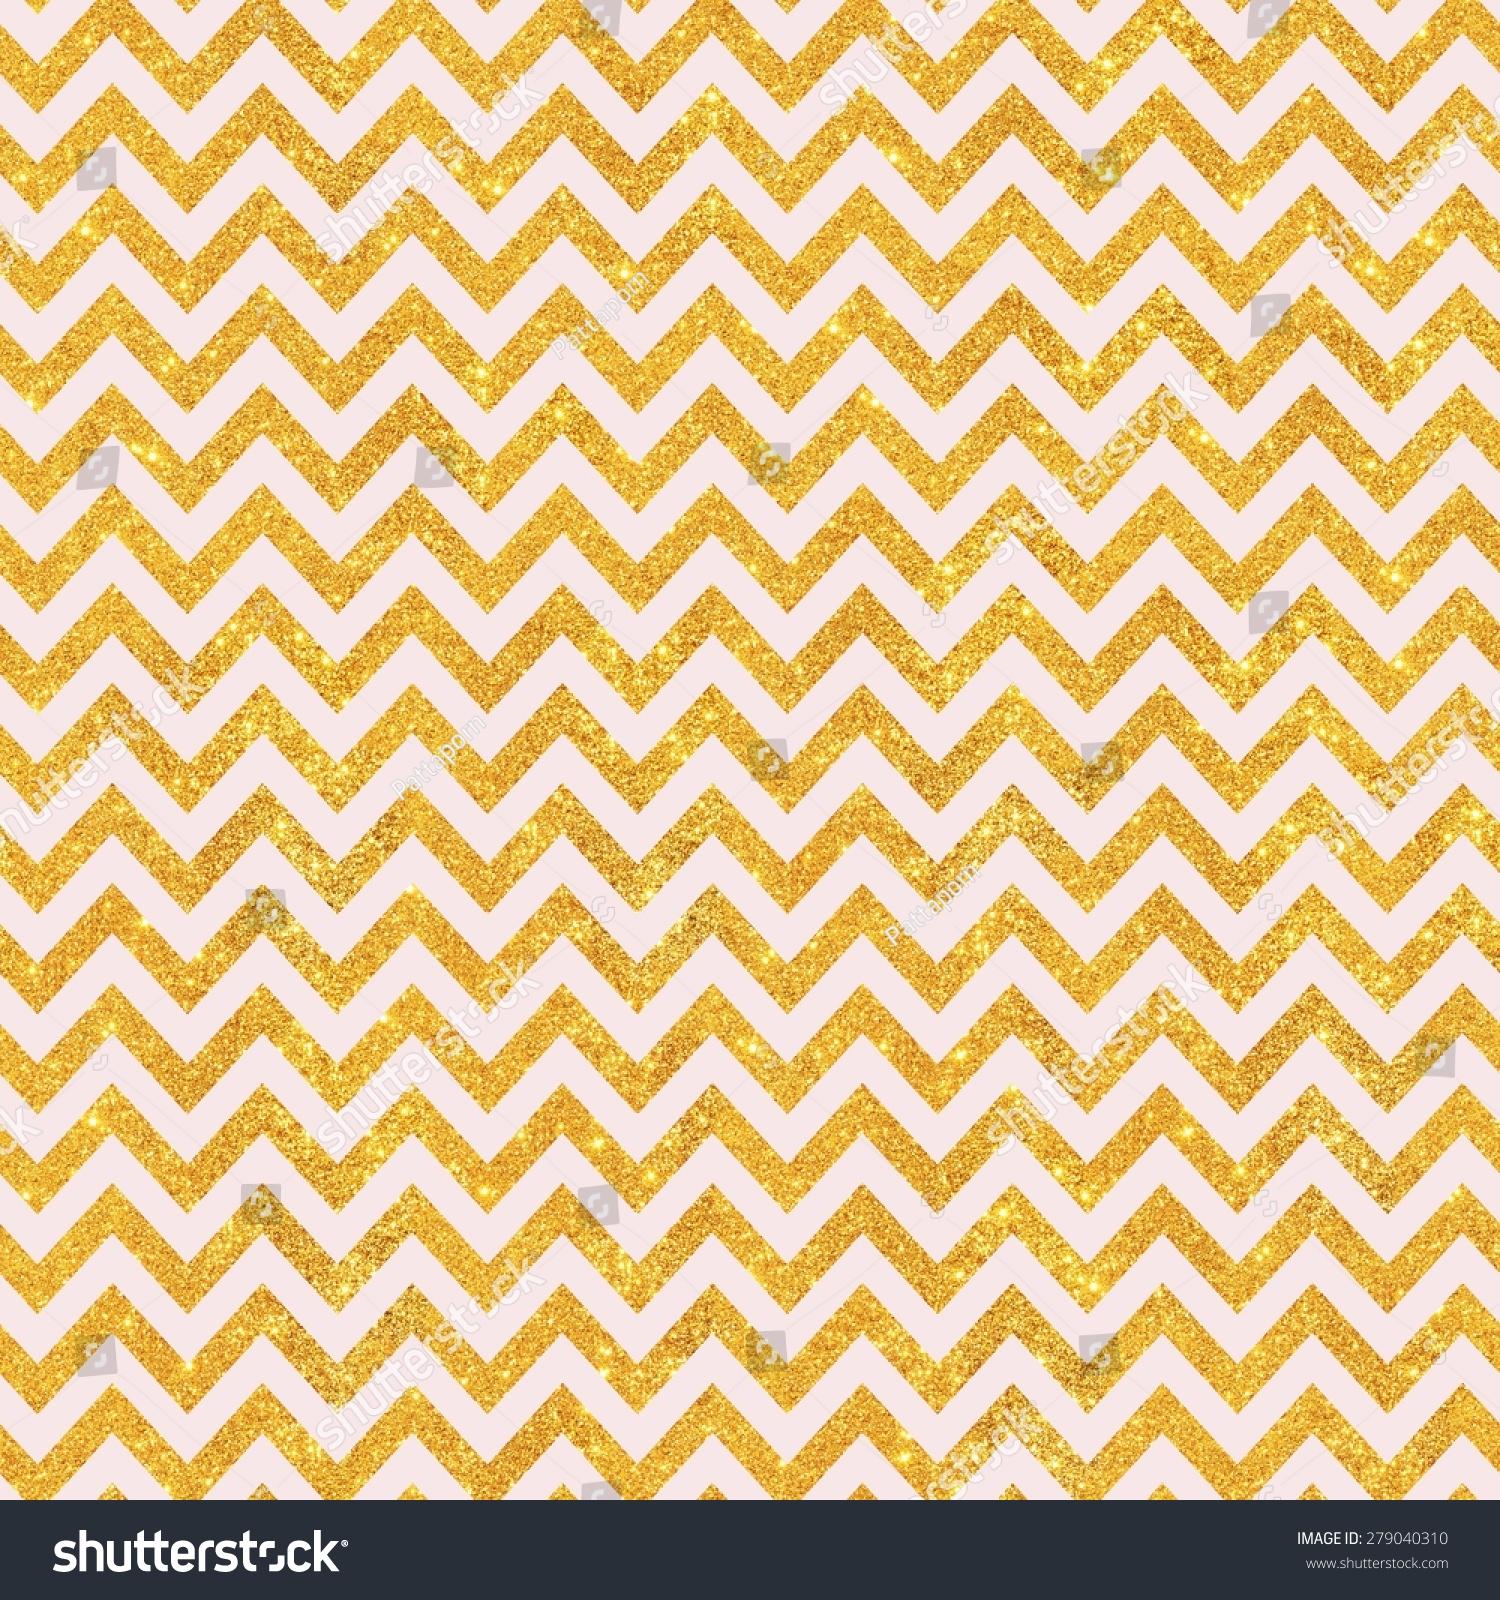 Pink Gold Glitter Chevron Pattern Seamless Texture Background Digital Paper For Scrapbook